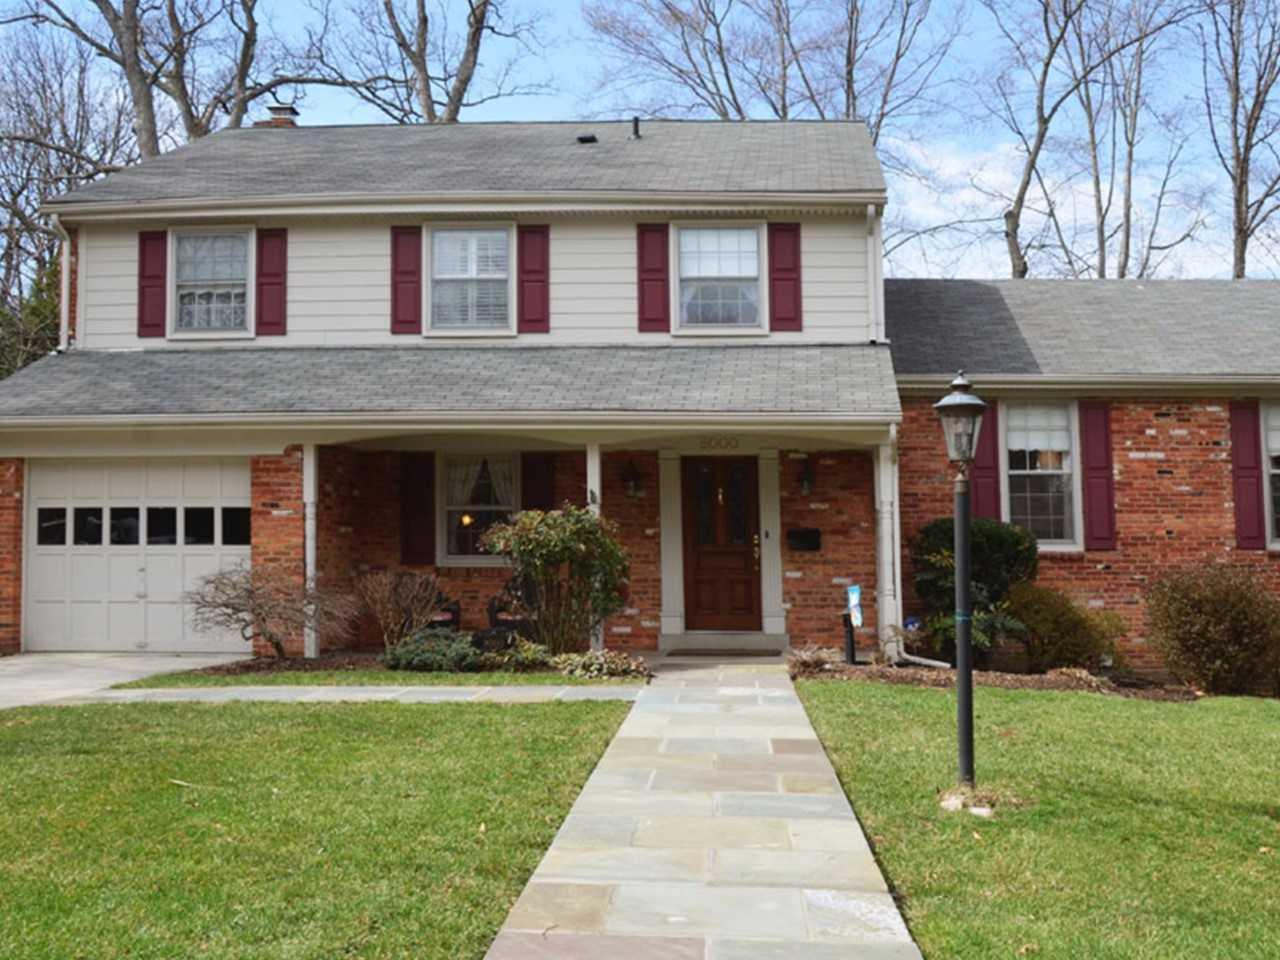 Single Family Home for Rent at 8000 Springer Road, Bethesda 8000 Springer Rd Bethesda, Maryland 20817 United States